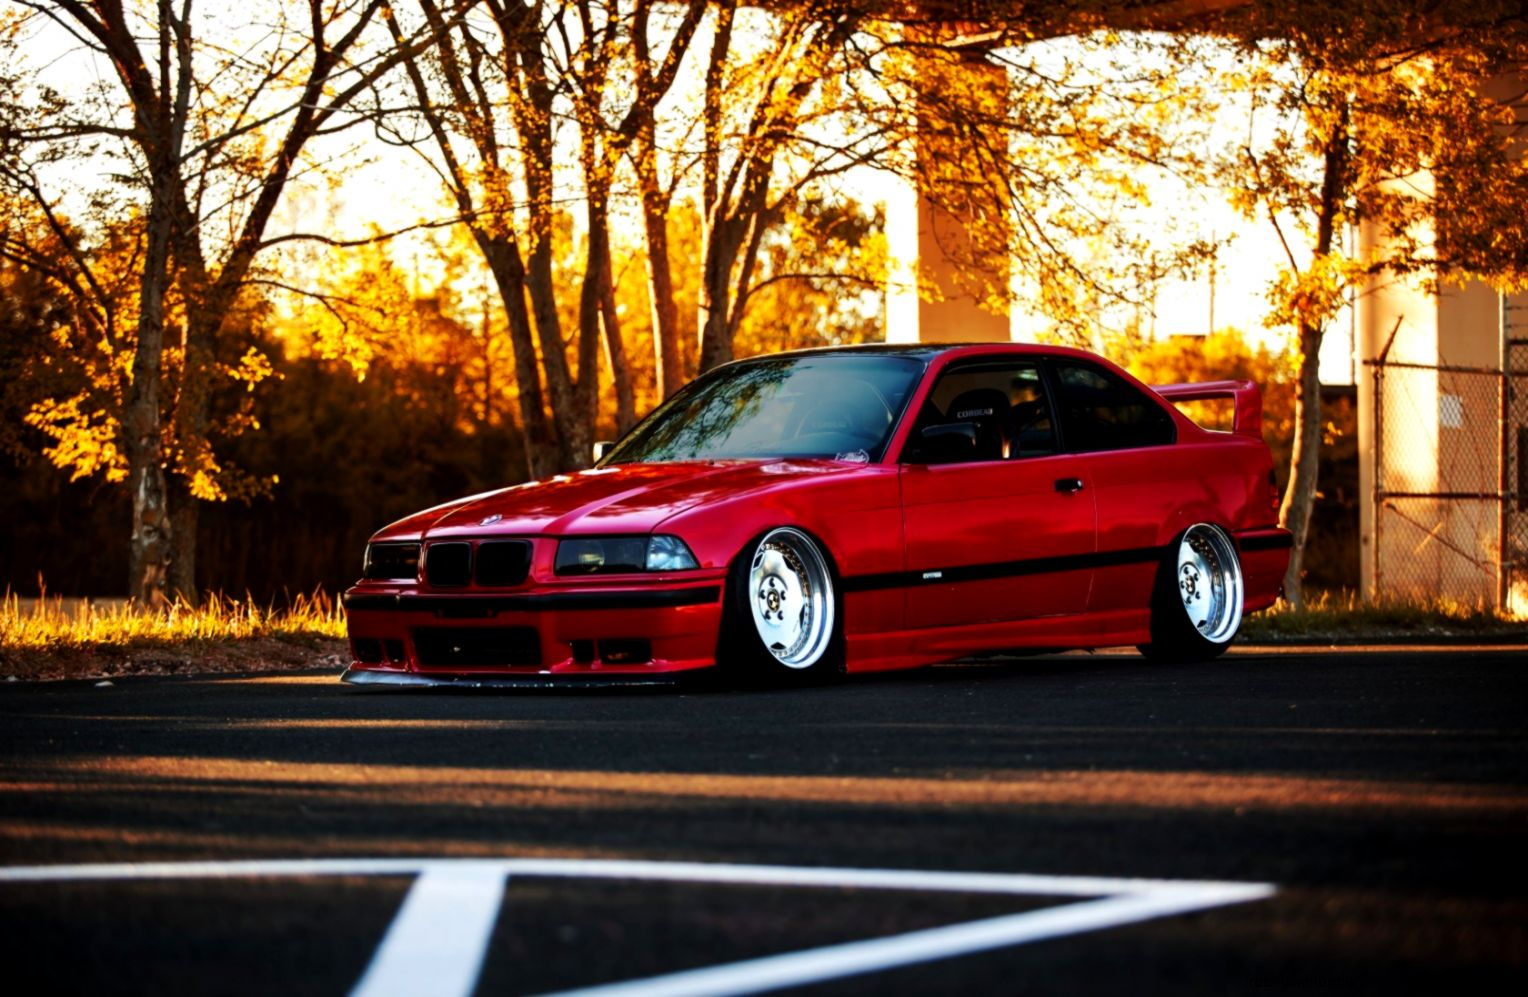 Bmw E36 Red Car Tuning Autumn Hd Wallpaper